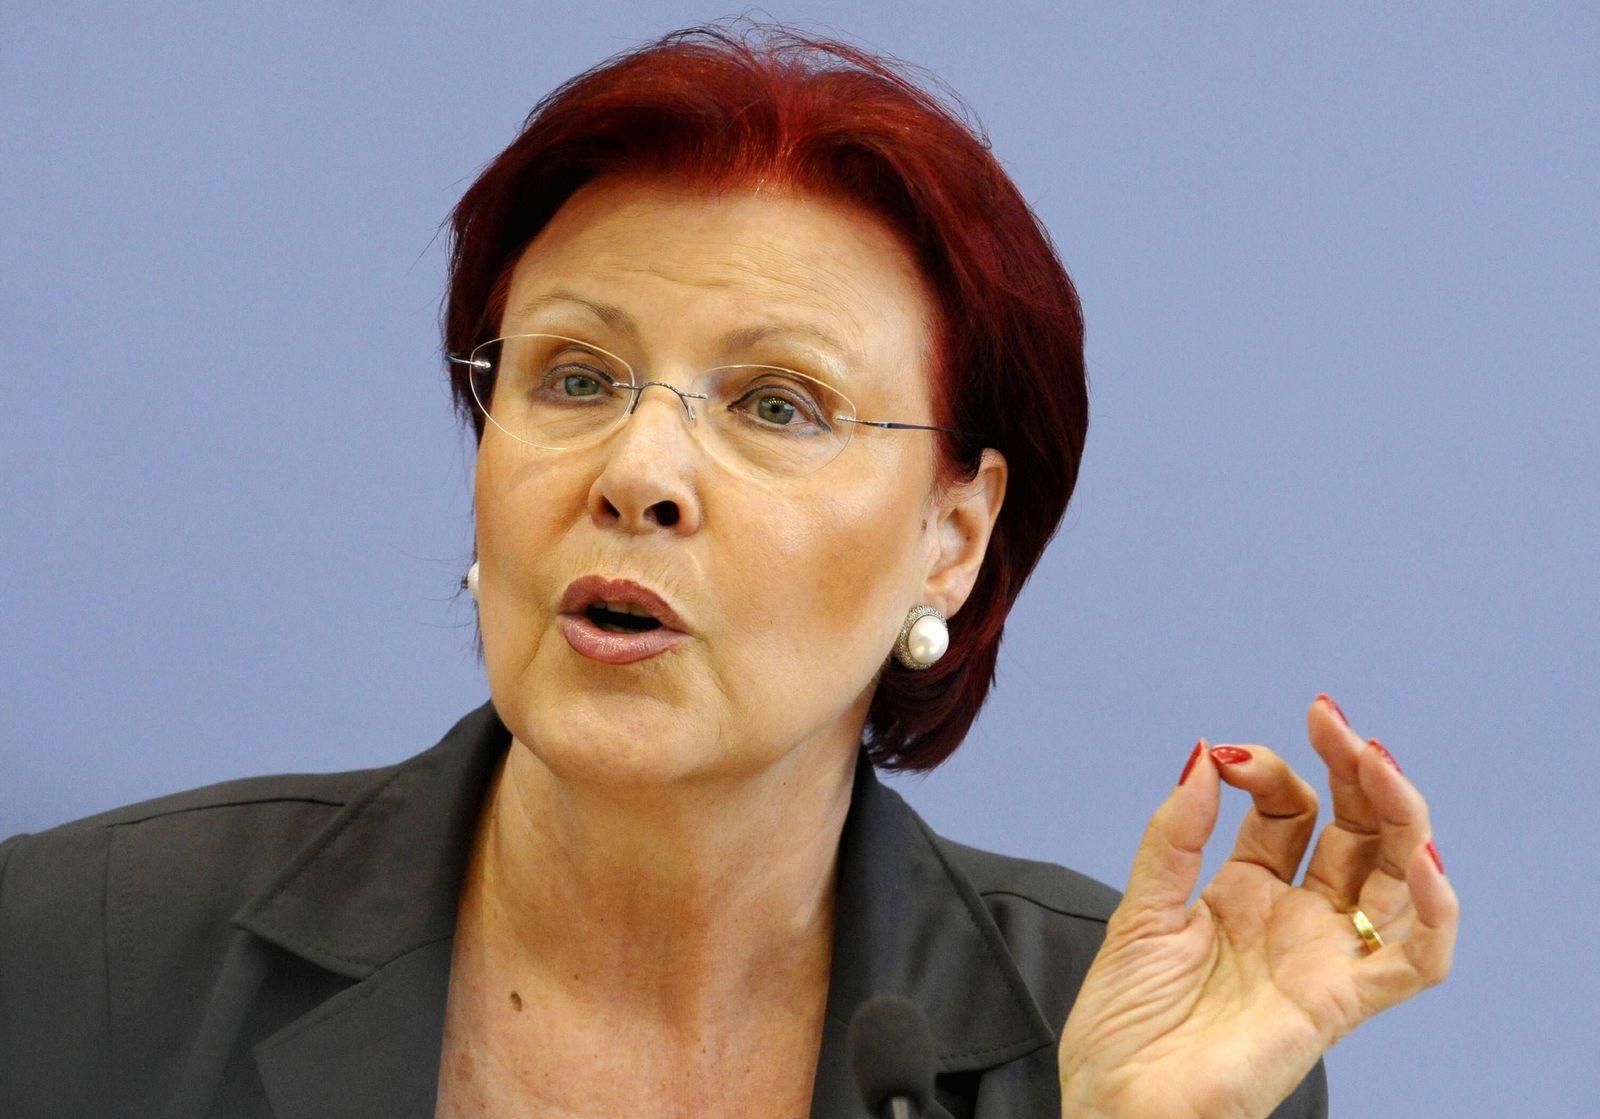 NICHT VERWENDEN Heidemarie Wieczorek-Zeul